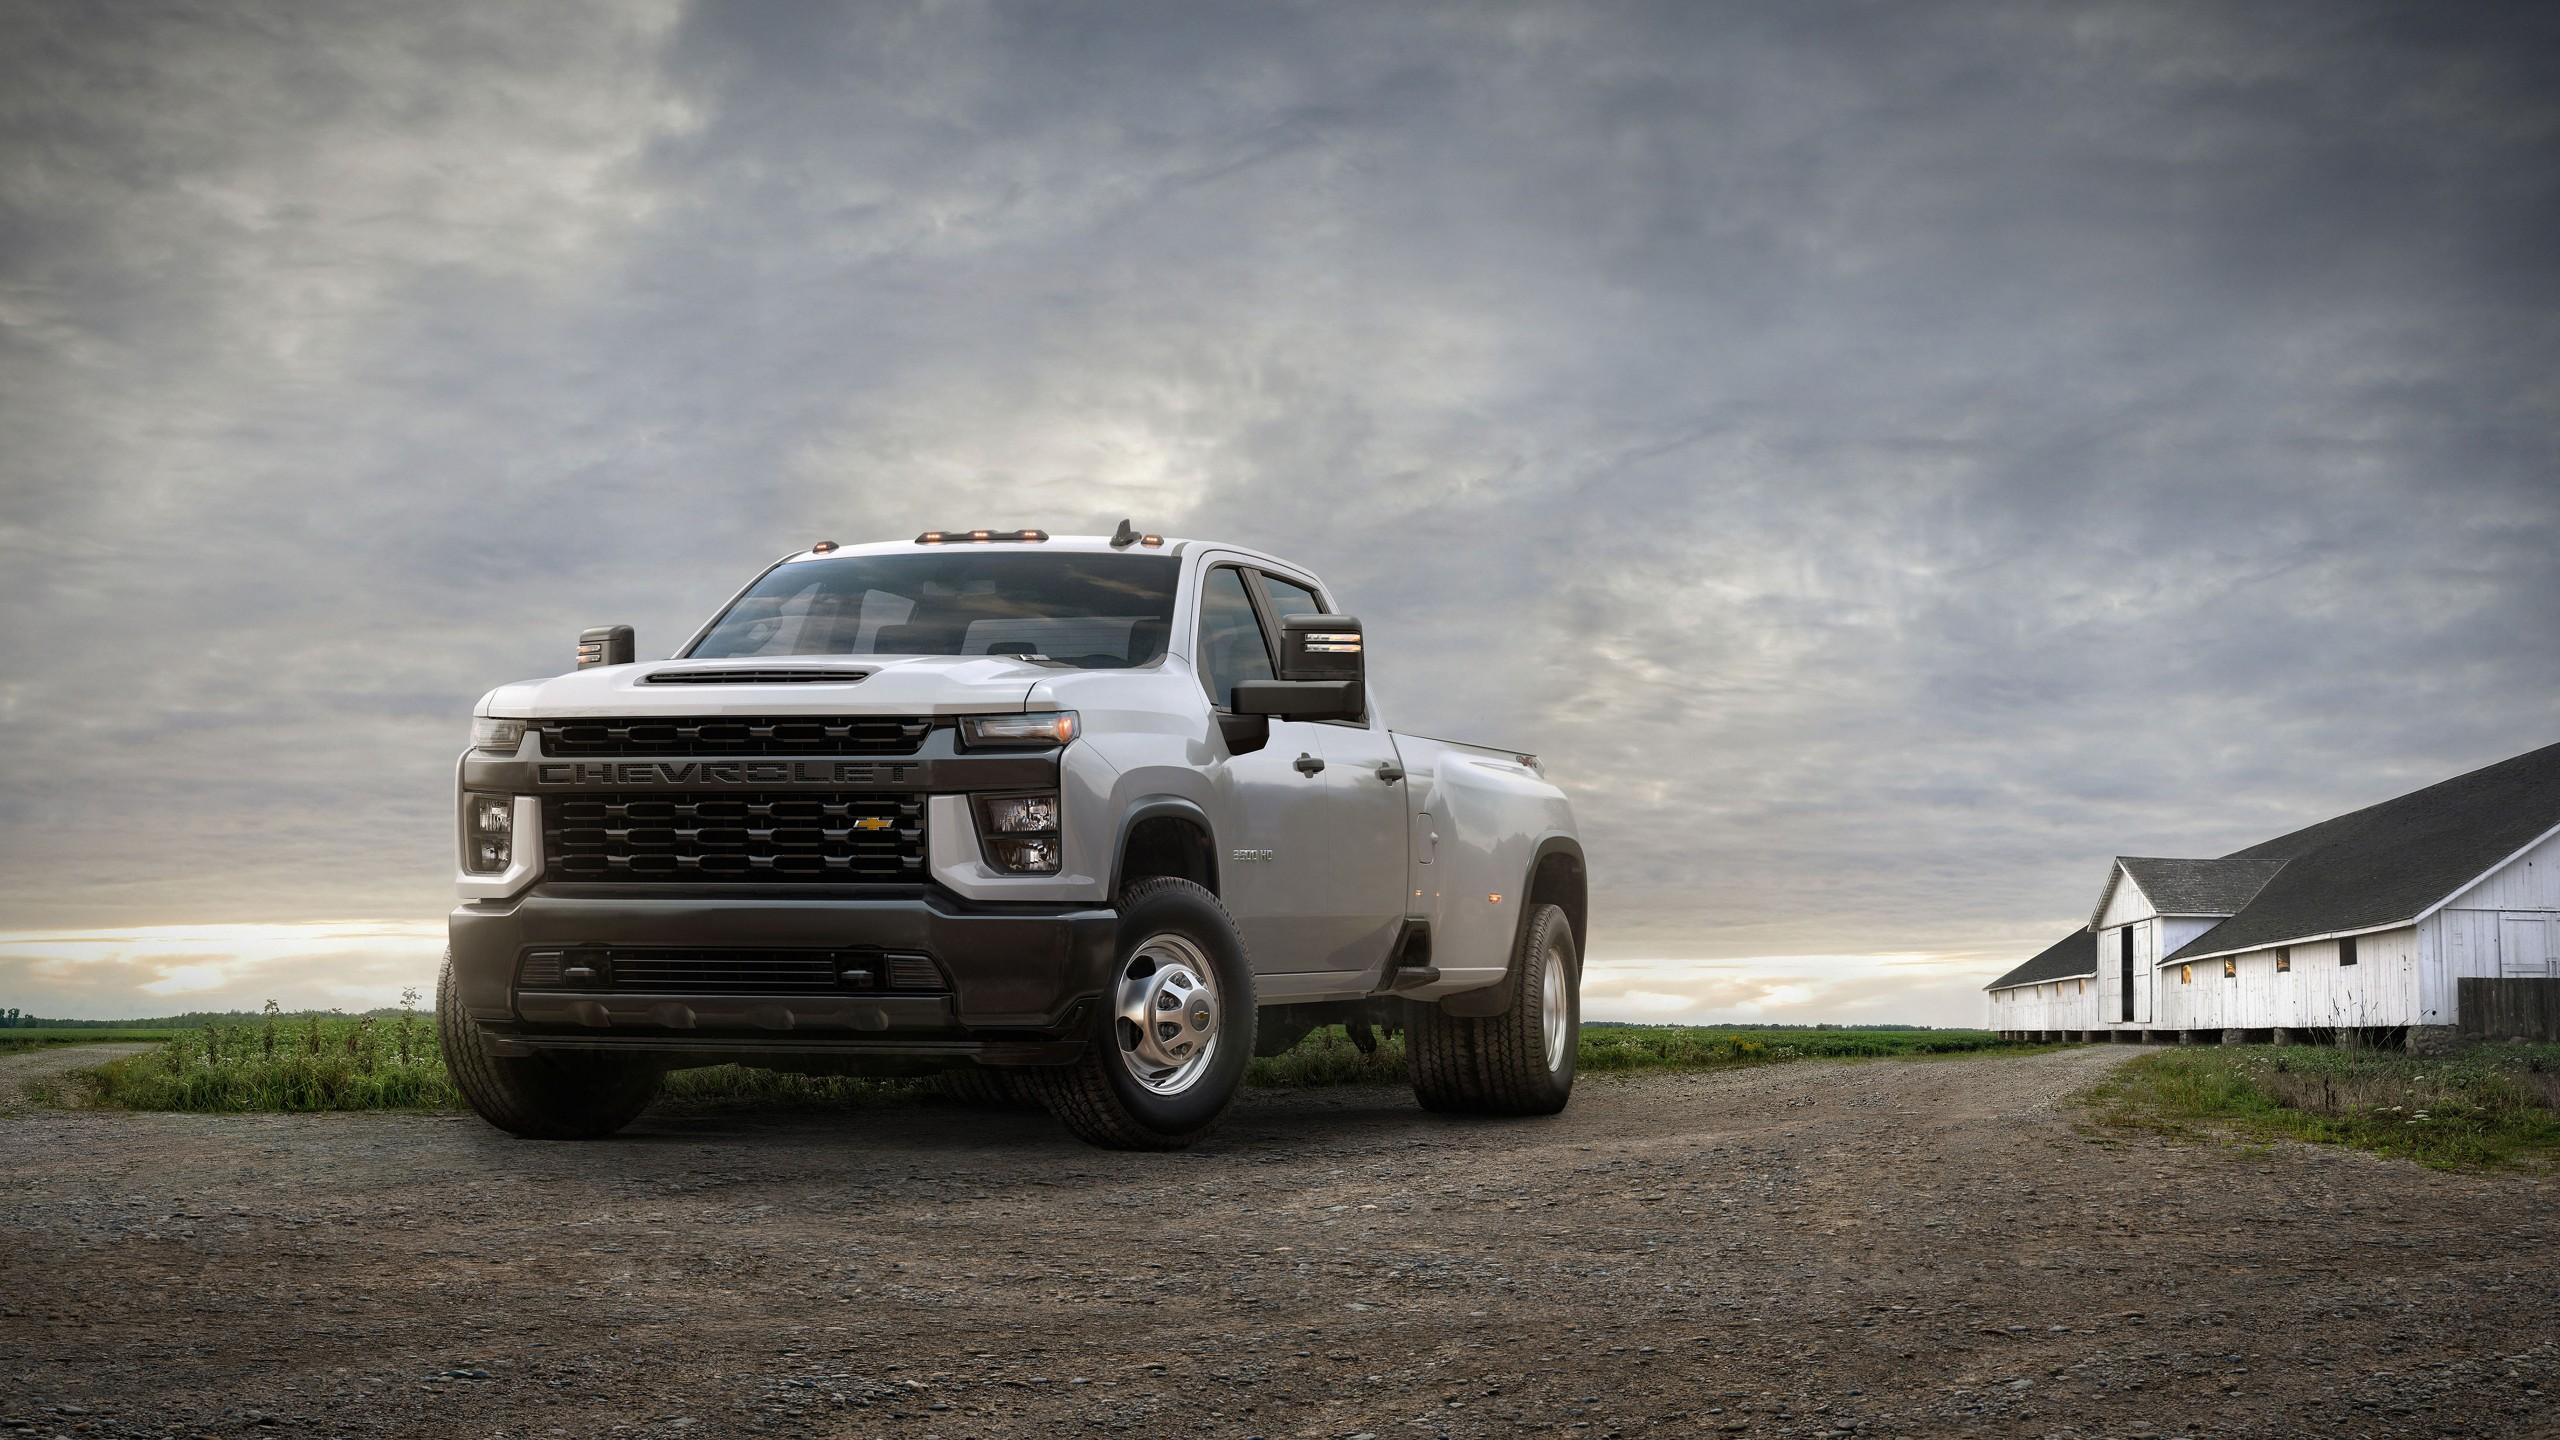 2020 Chevrolet Silverado 3500 Hd Drw Work Truck 4k